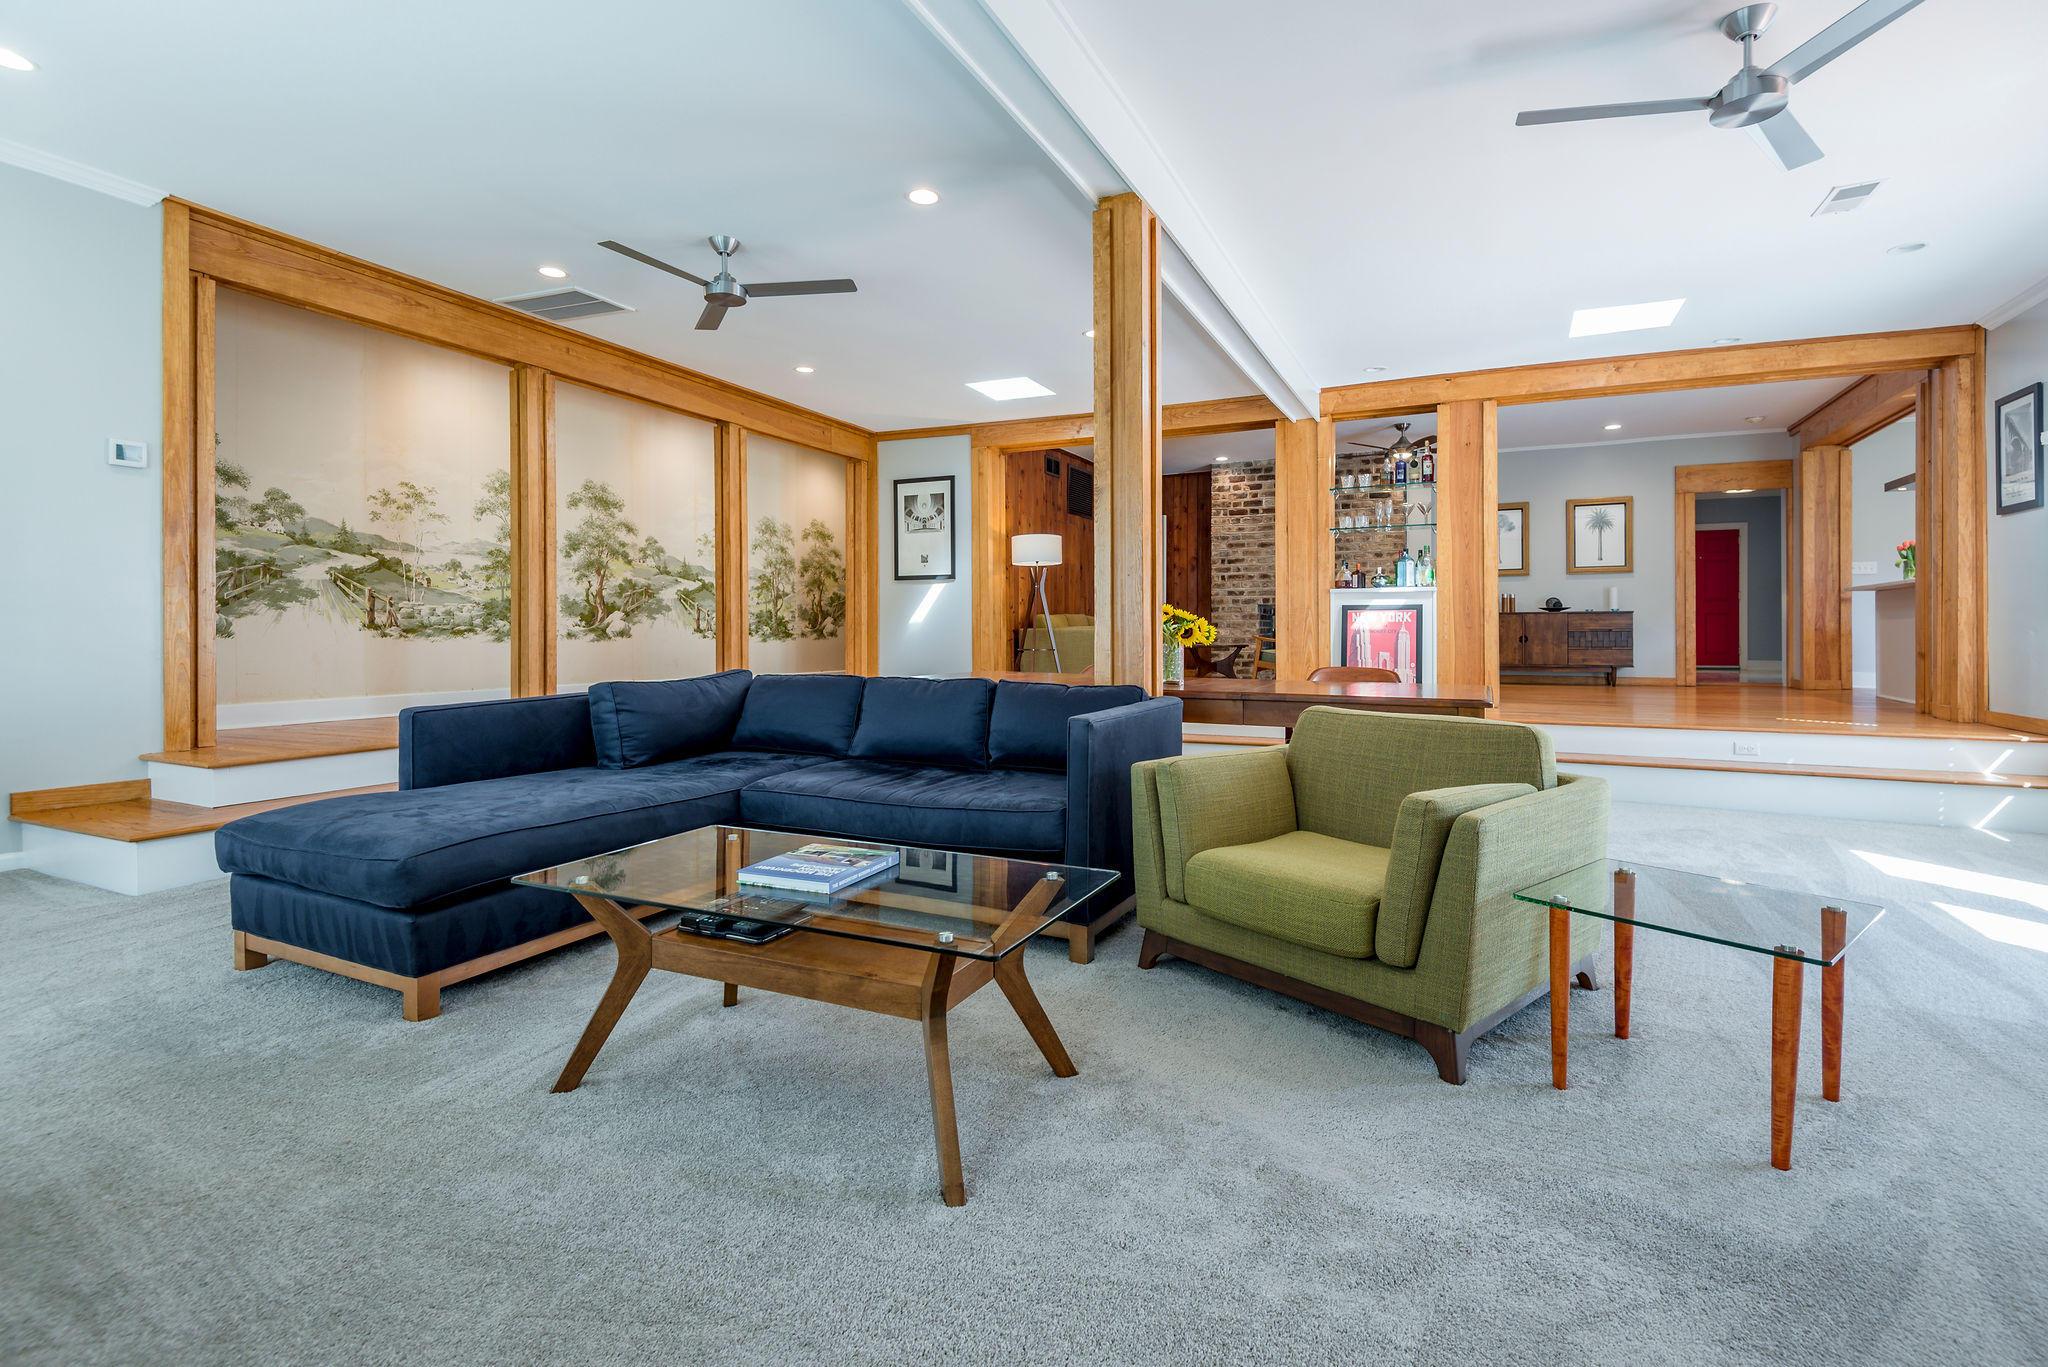 Sylvan Shores Homes For Sale - 450 Polony, Charleston, SC - 36